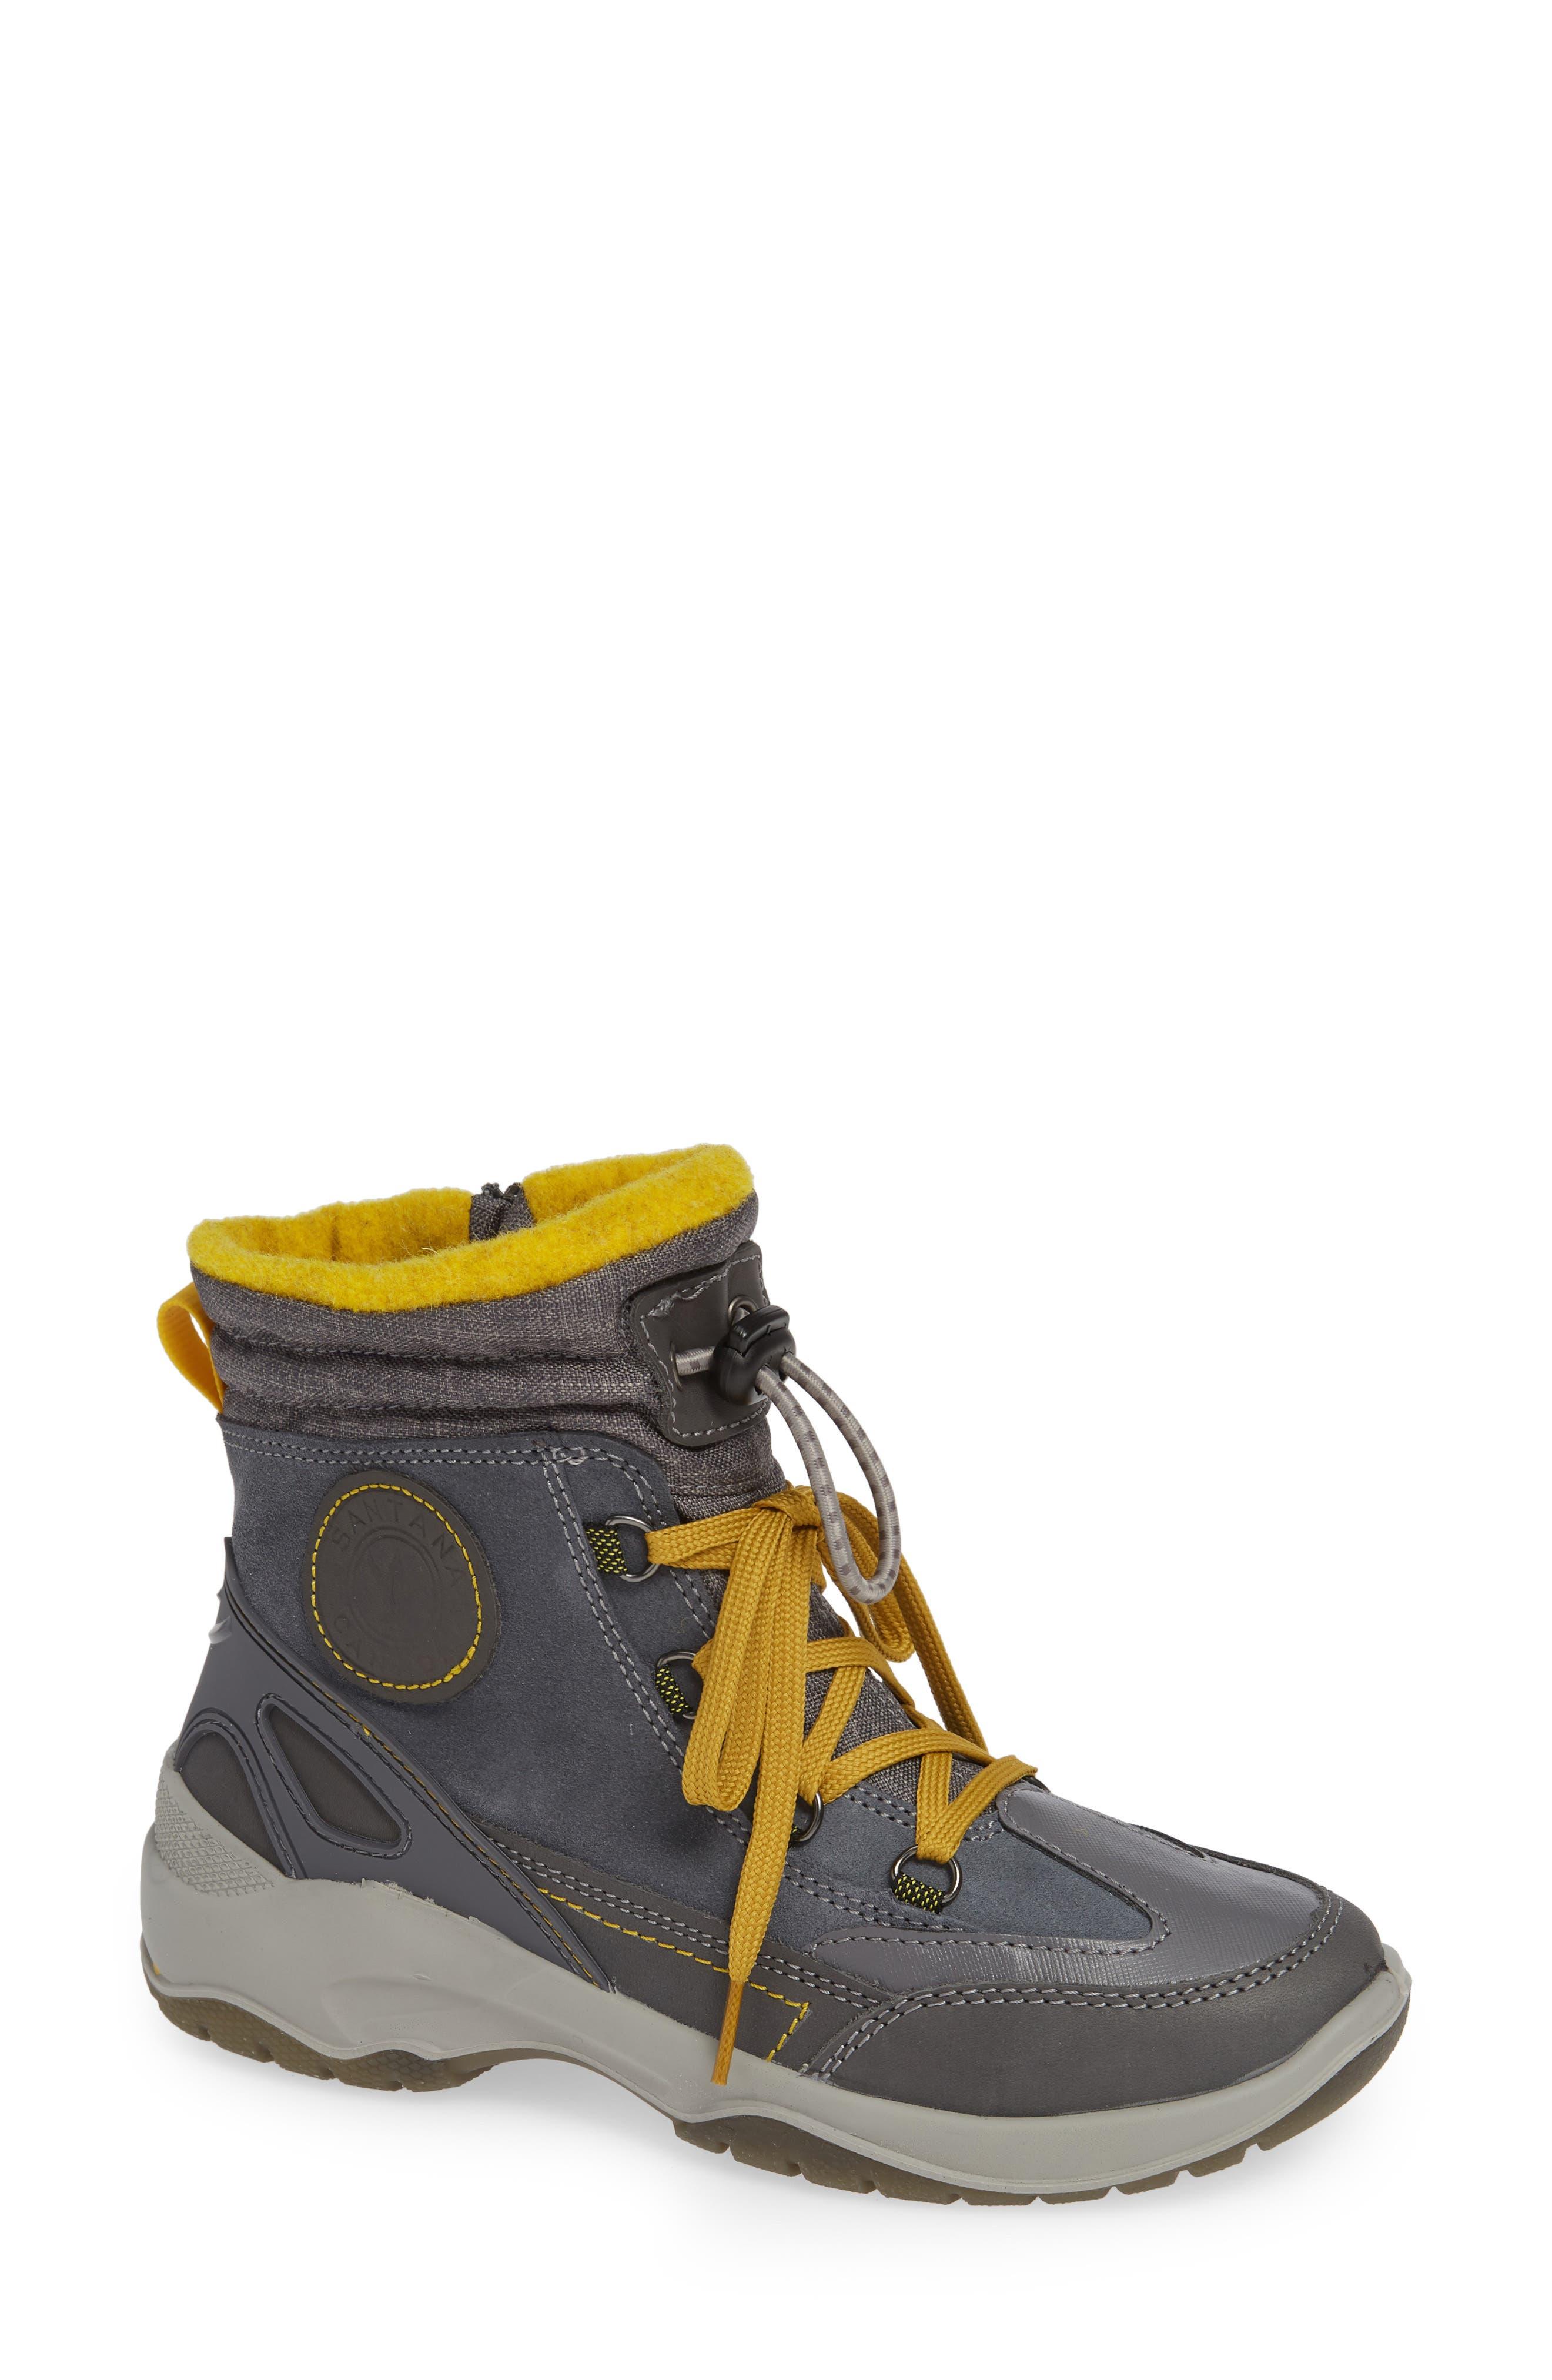 Santana Canada Torino Waterproof Insulated Lace-Up Winter Boot, Grey